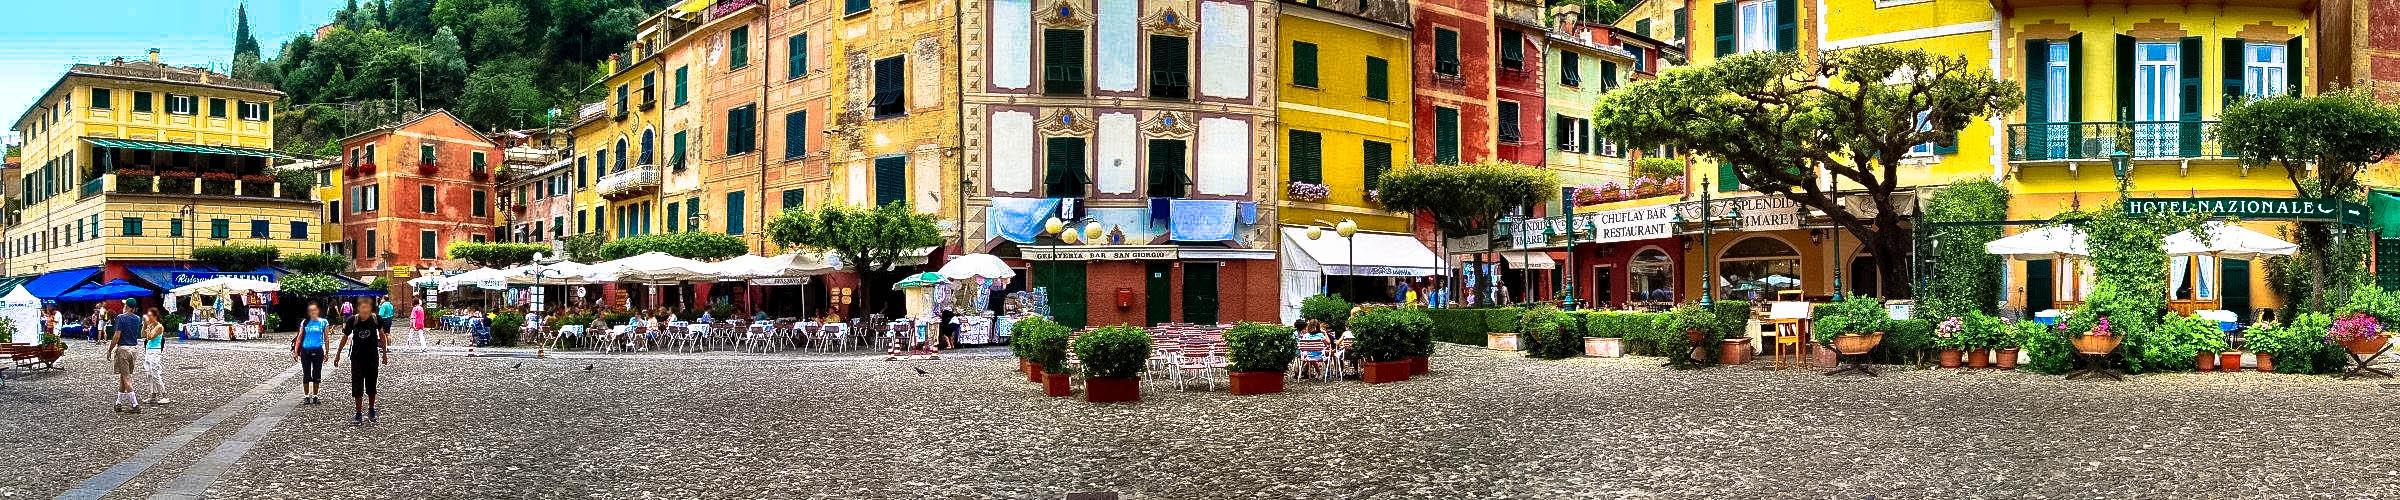 Portofino Piazzetta